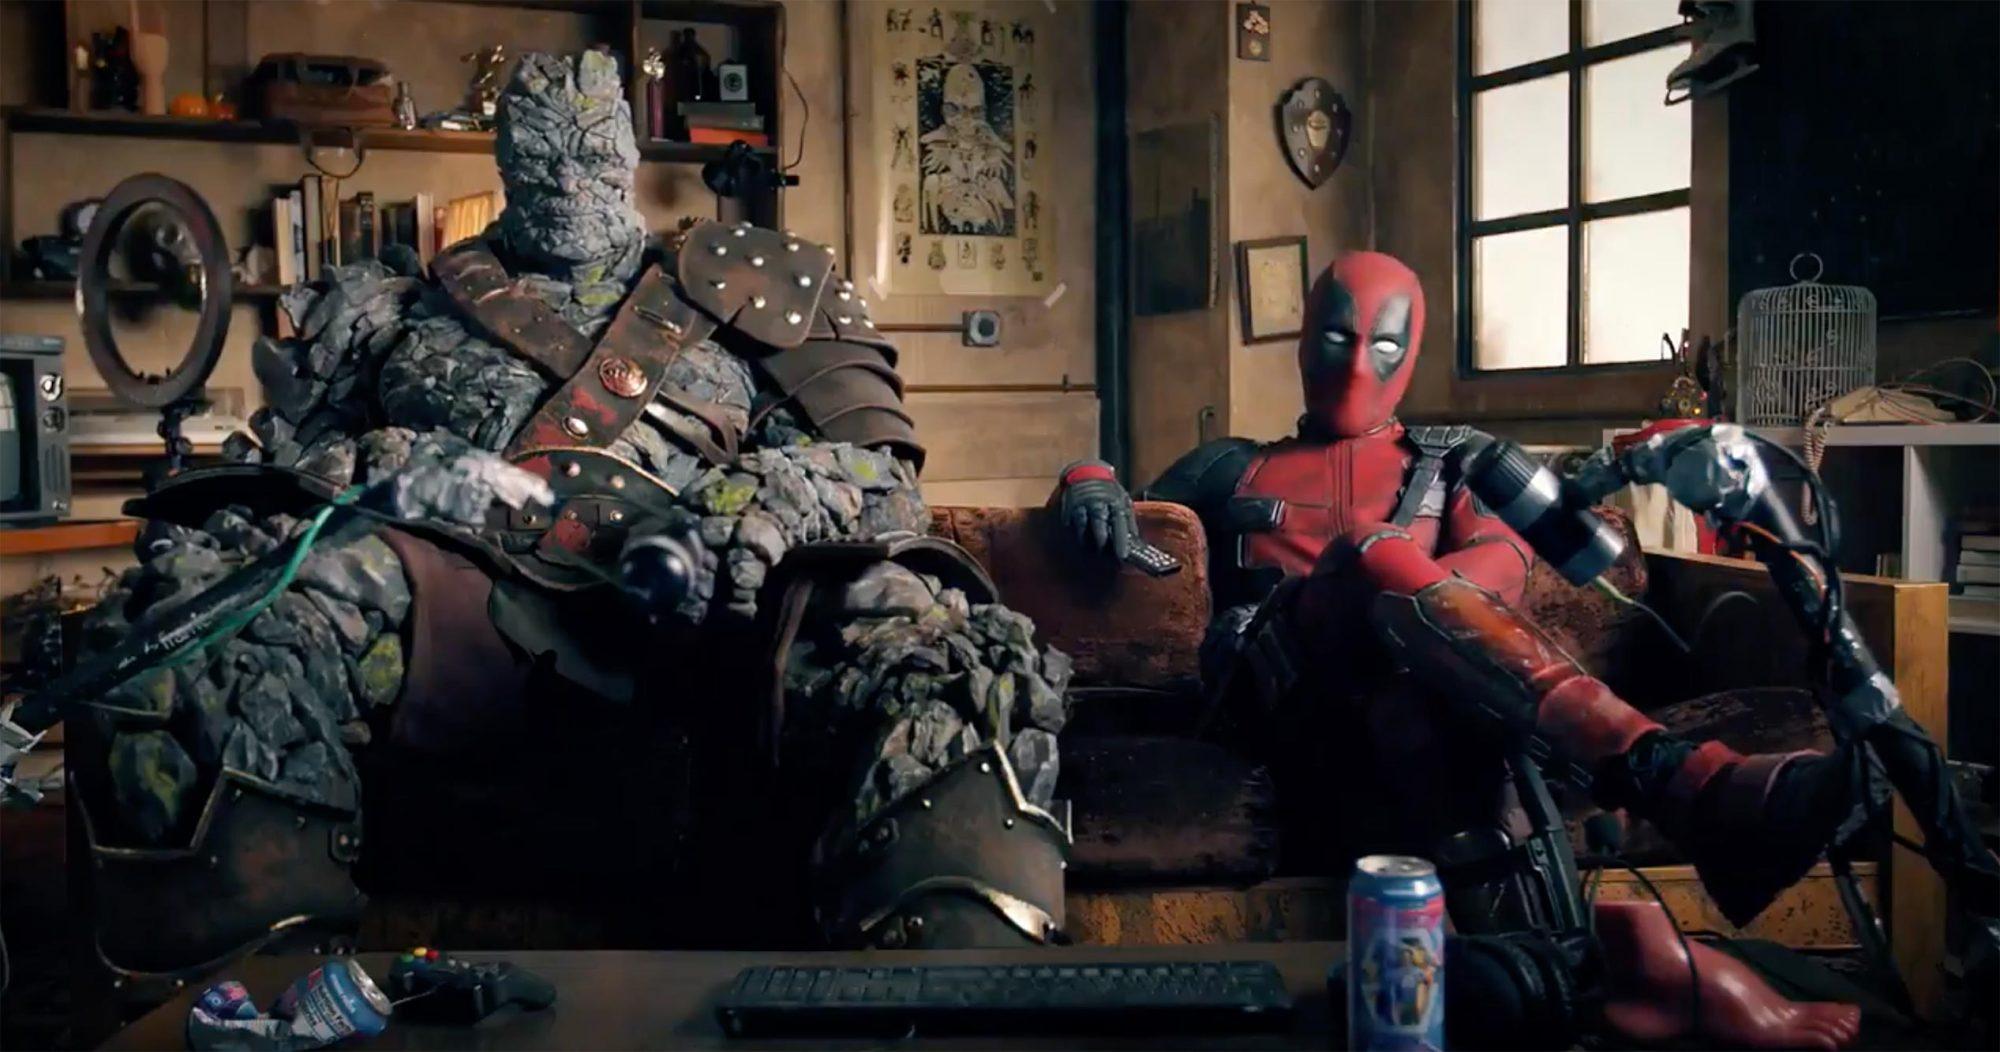 Korg and Deadpool